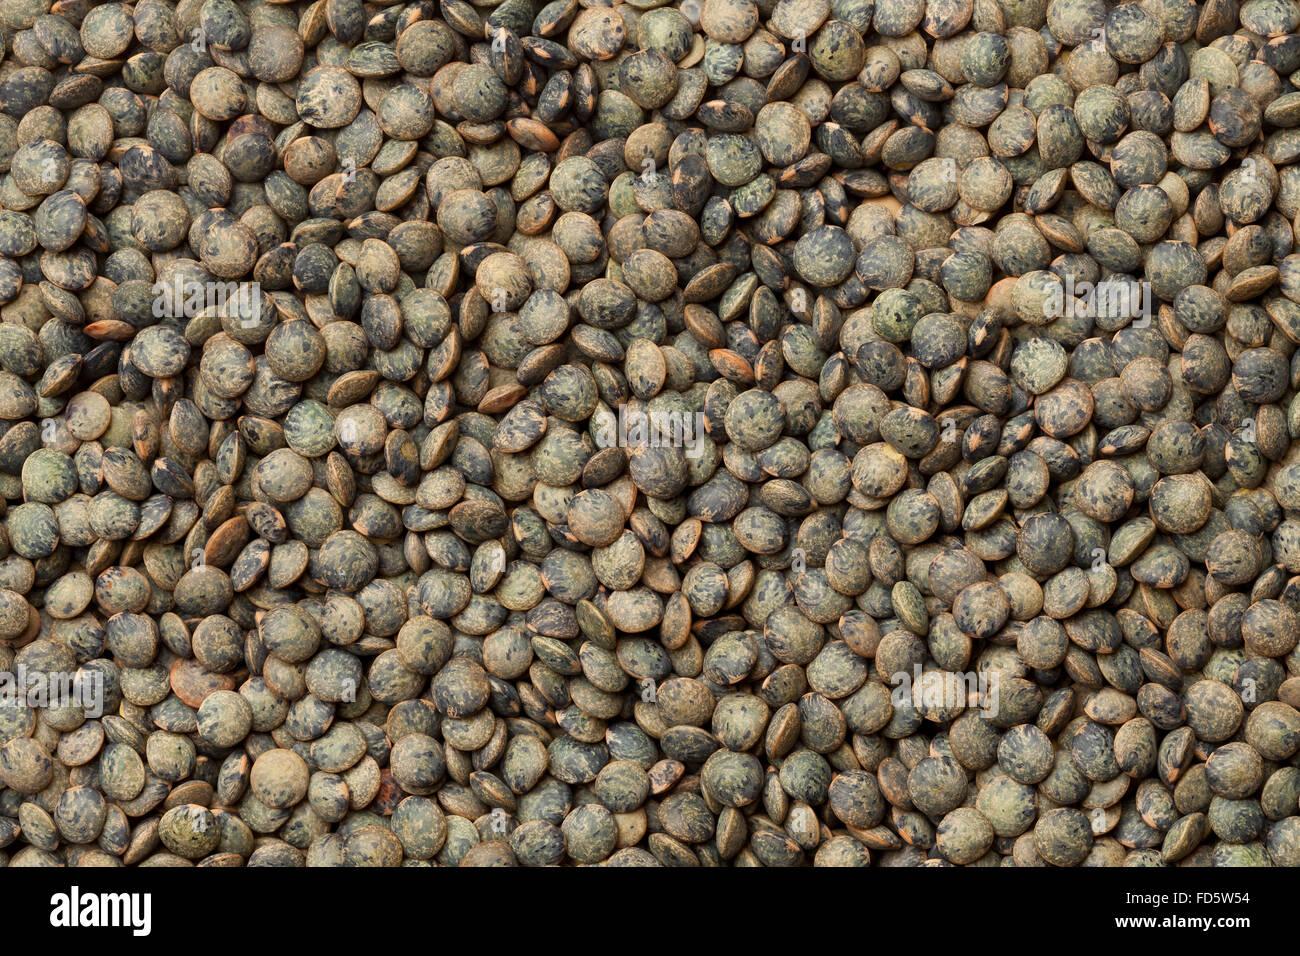 Getrocknete Du Puy-Linsen-full-frame Stockfoto, Bild: 94171872 - Alamy